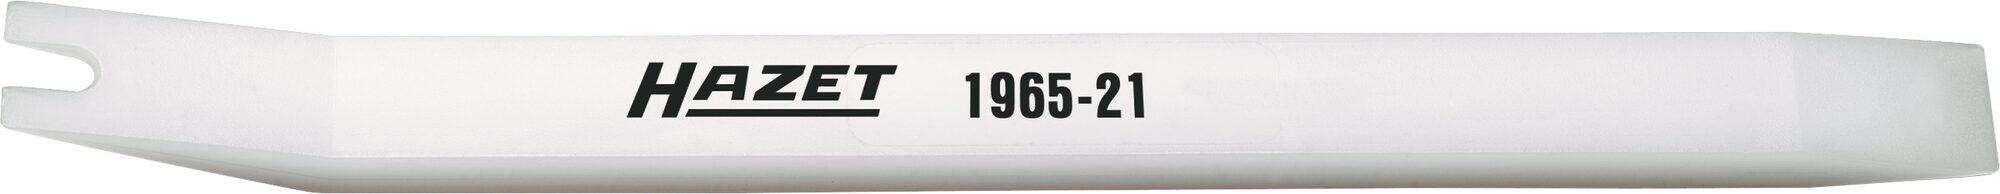 HAZET Kombinations-Montagekeil 1965-21